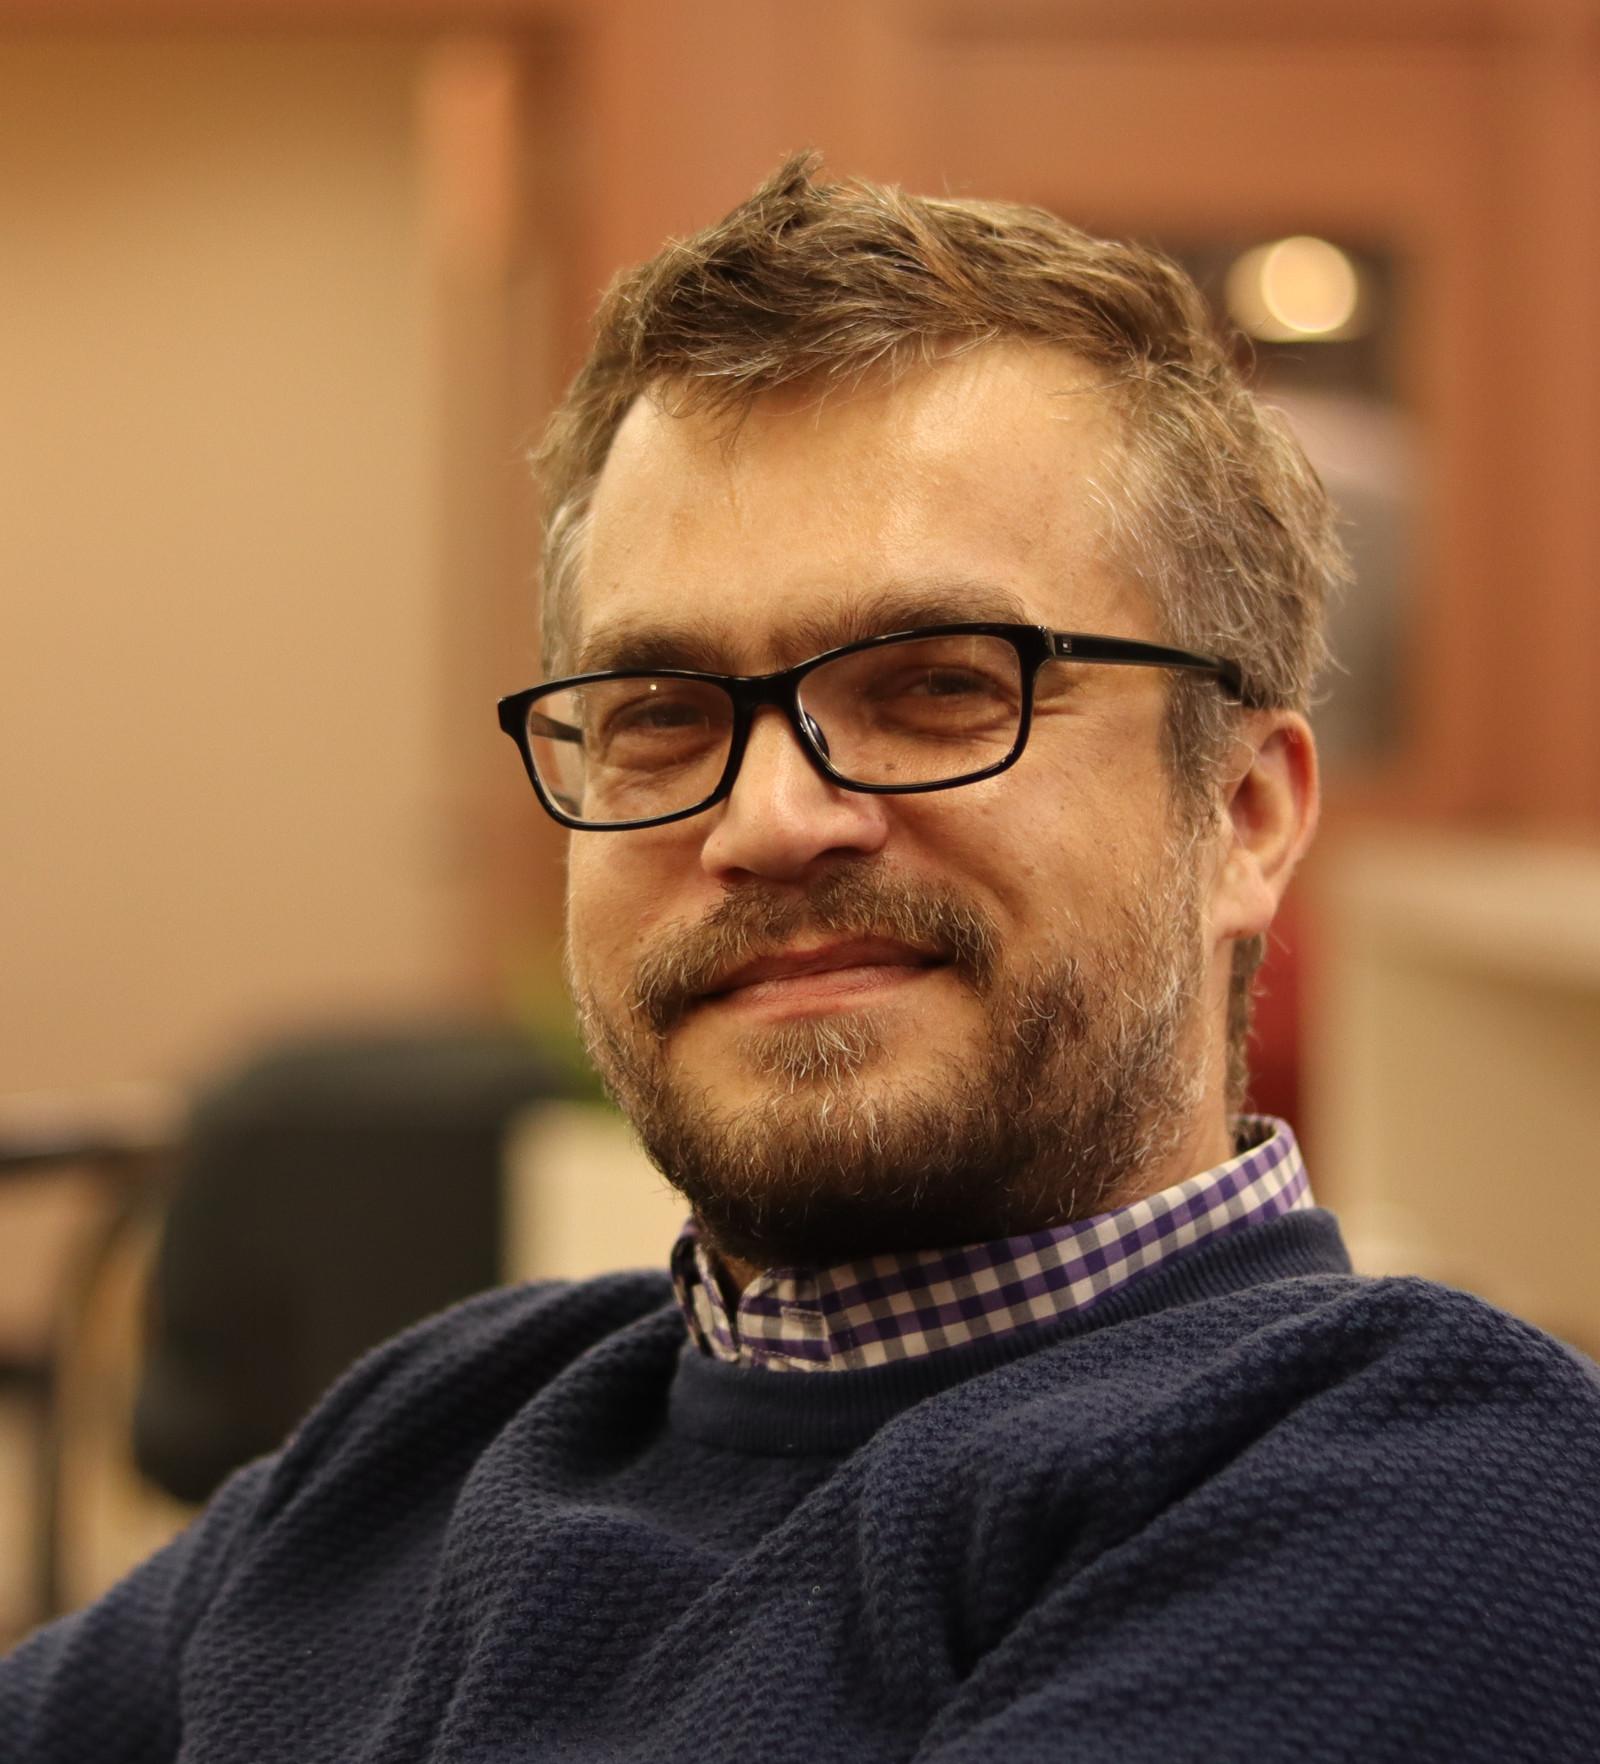 Michal Konicek